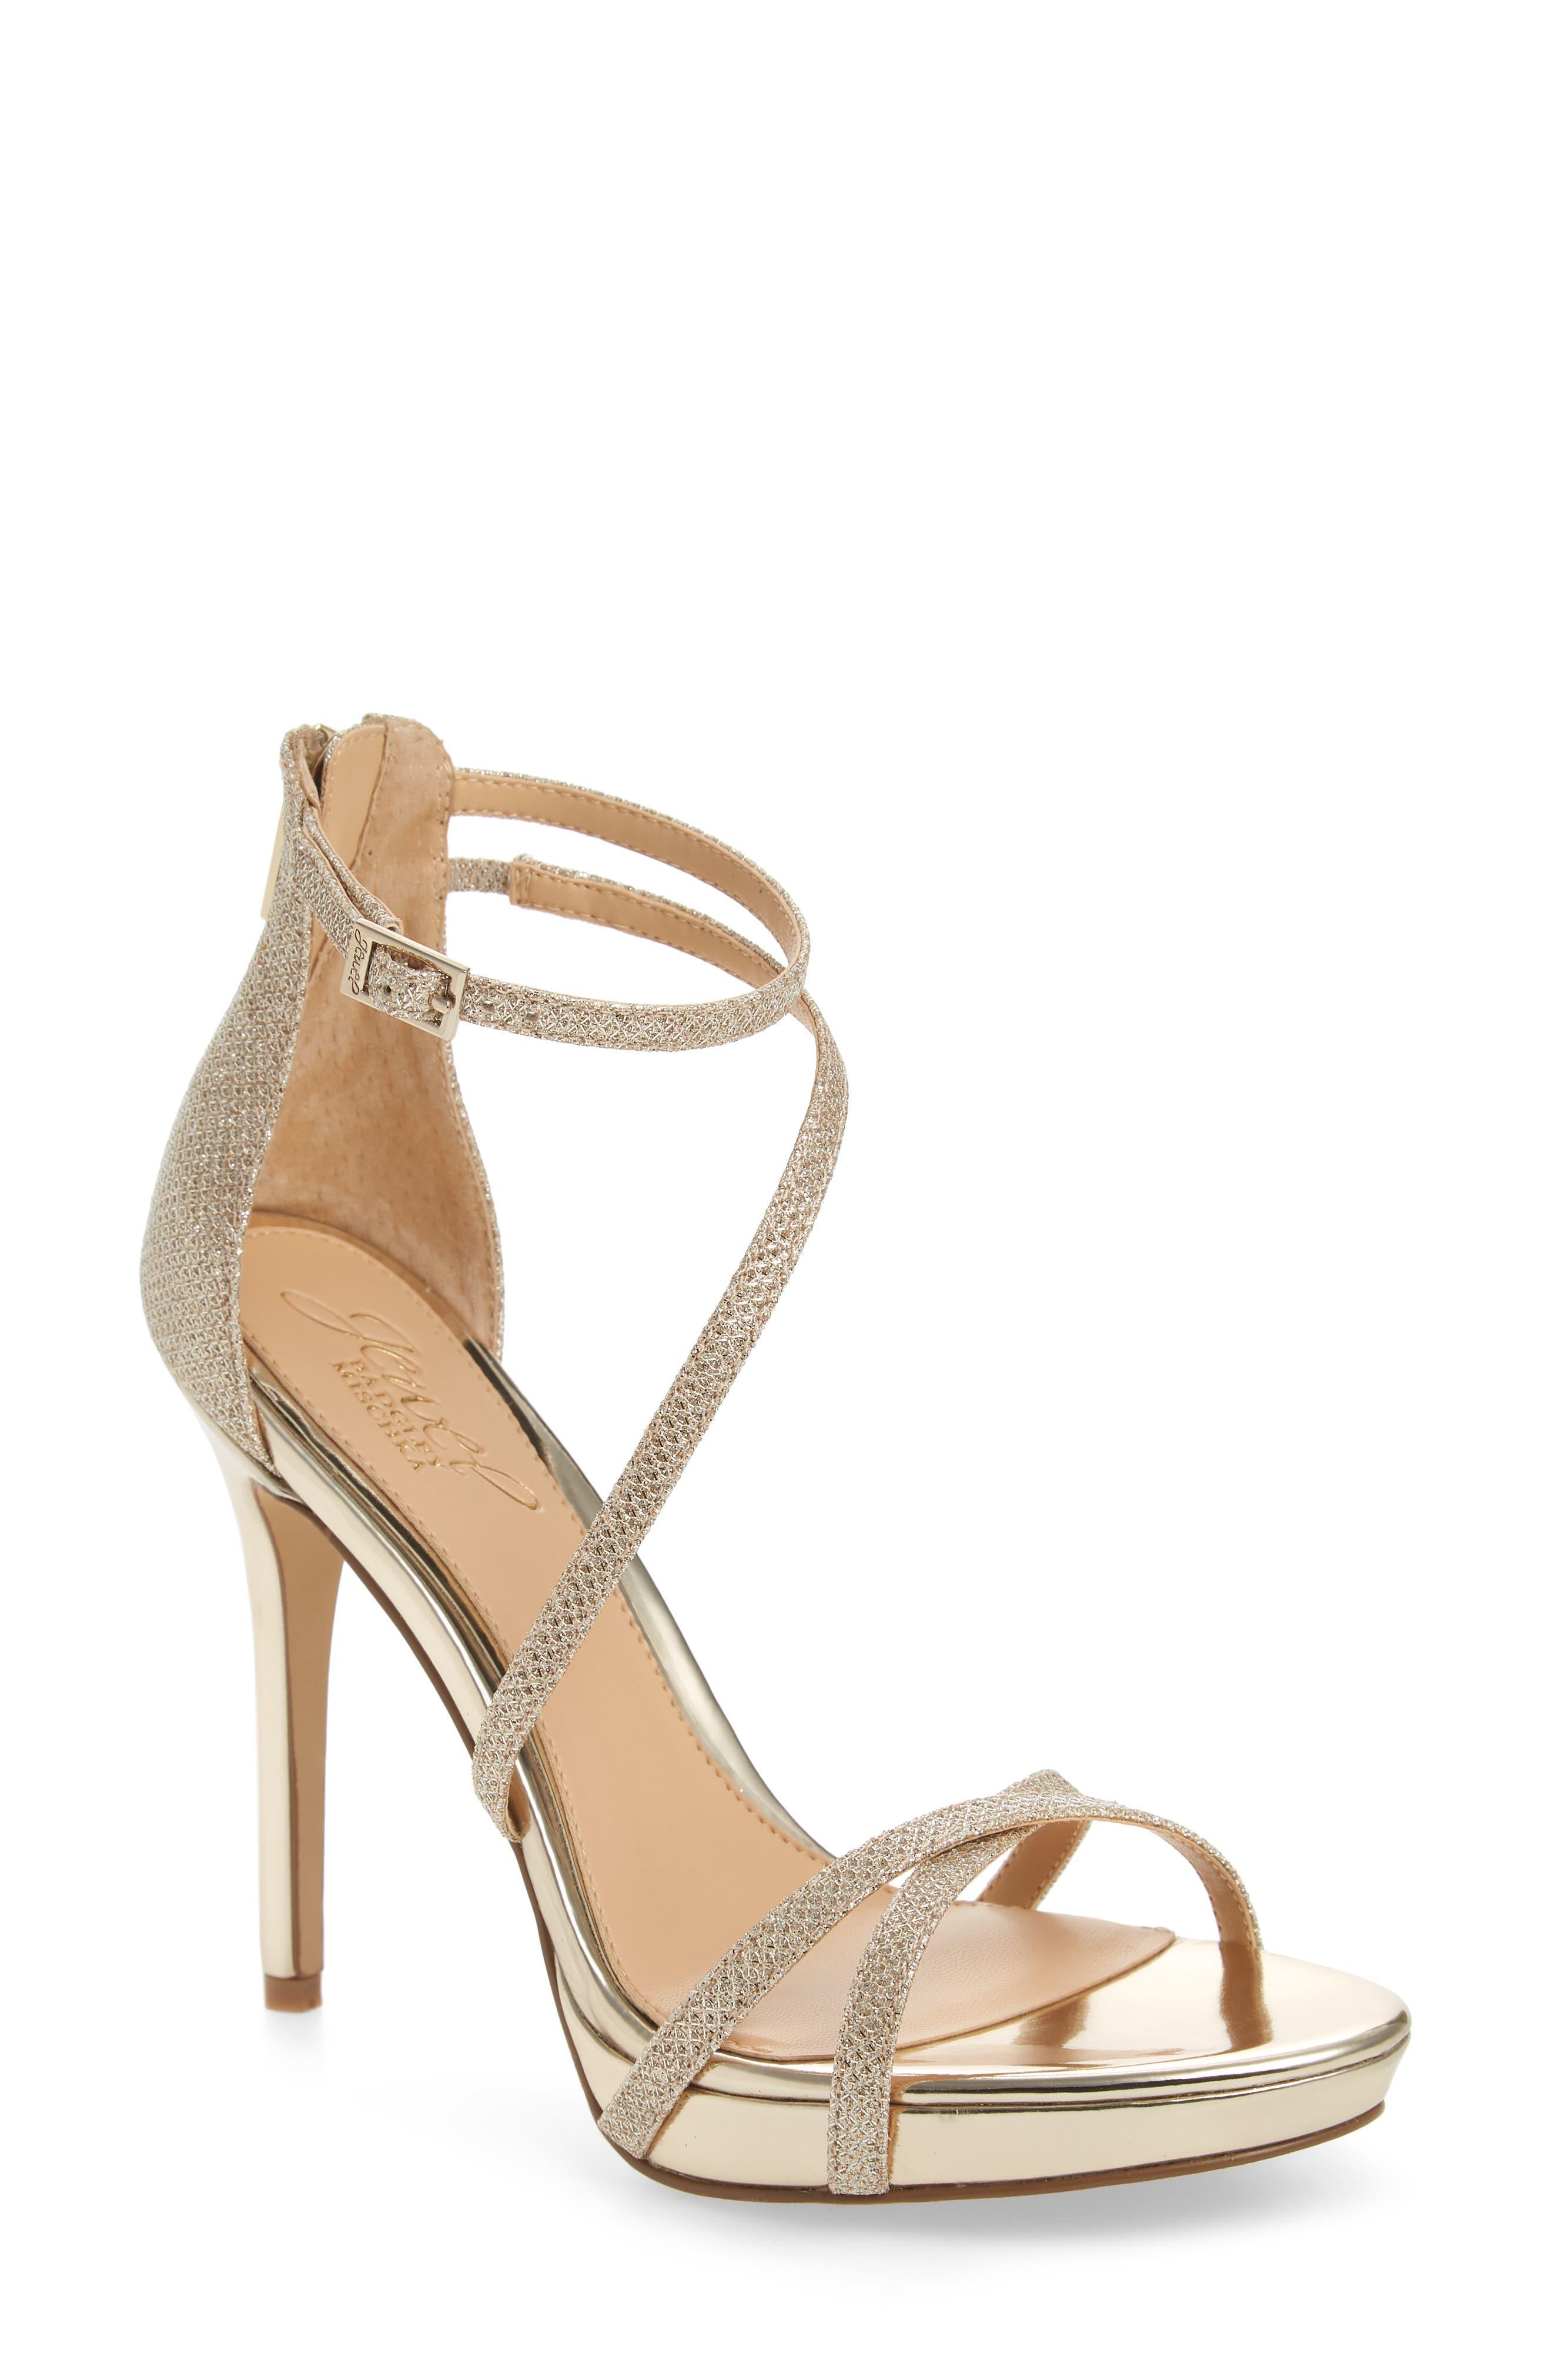 Galen Strappy Platform Sandal,                             Main thumbnail 1, color,                             Gold Glitter Fabric